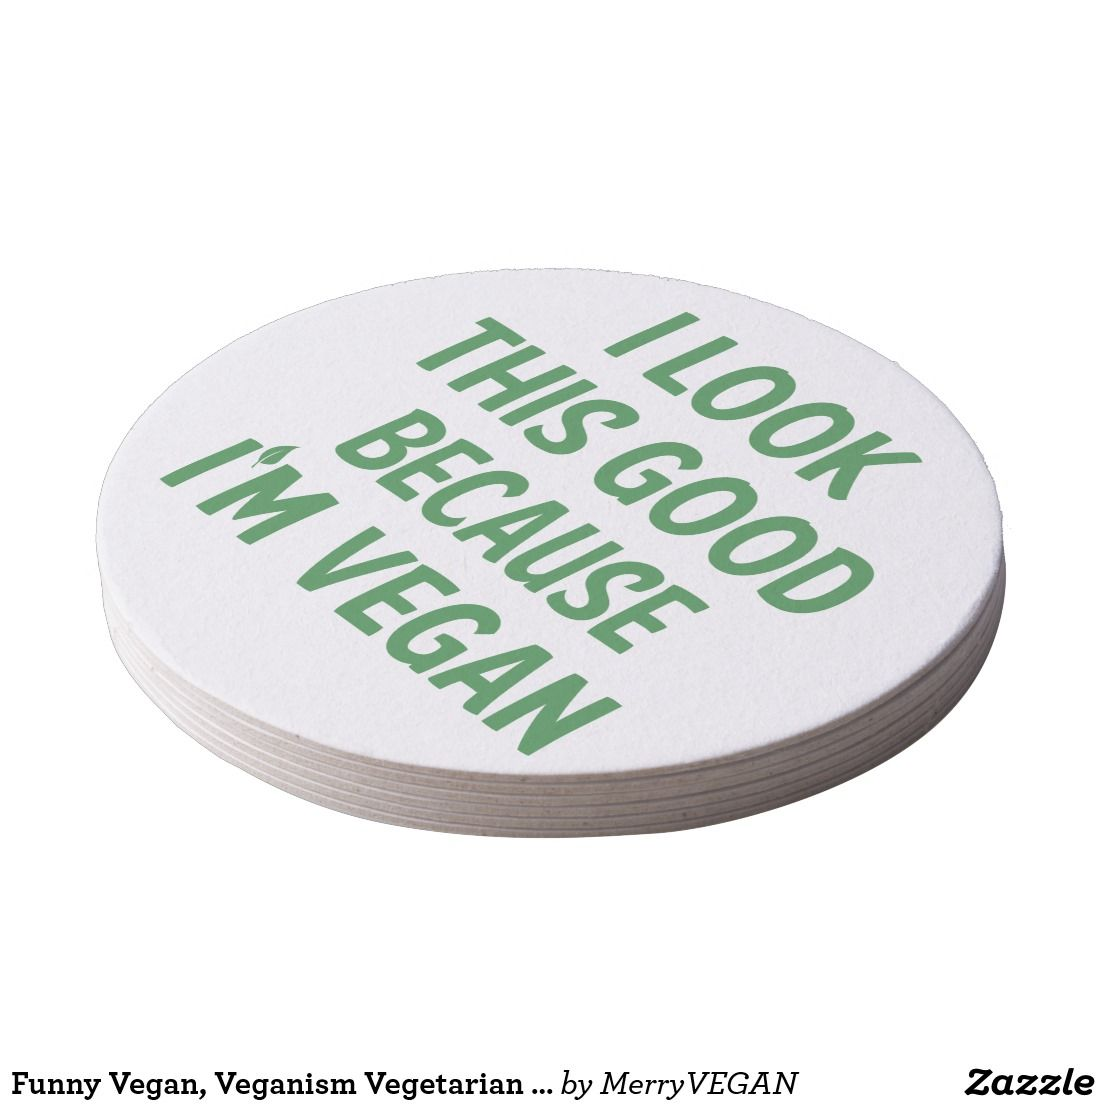 Funny Vegan, Veganism Vegetarian Quote Green White Round Paper Coaster | Zazzle.com #vegetarianquotes